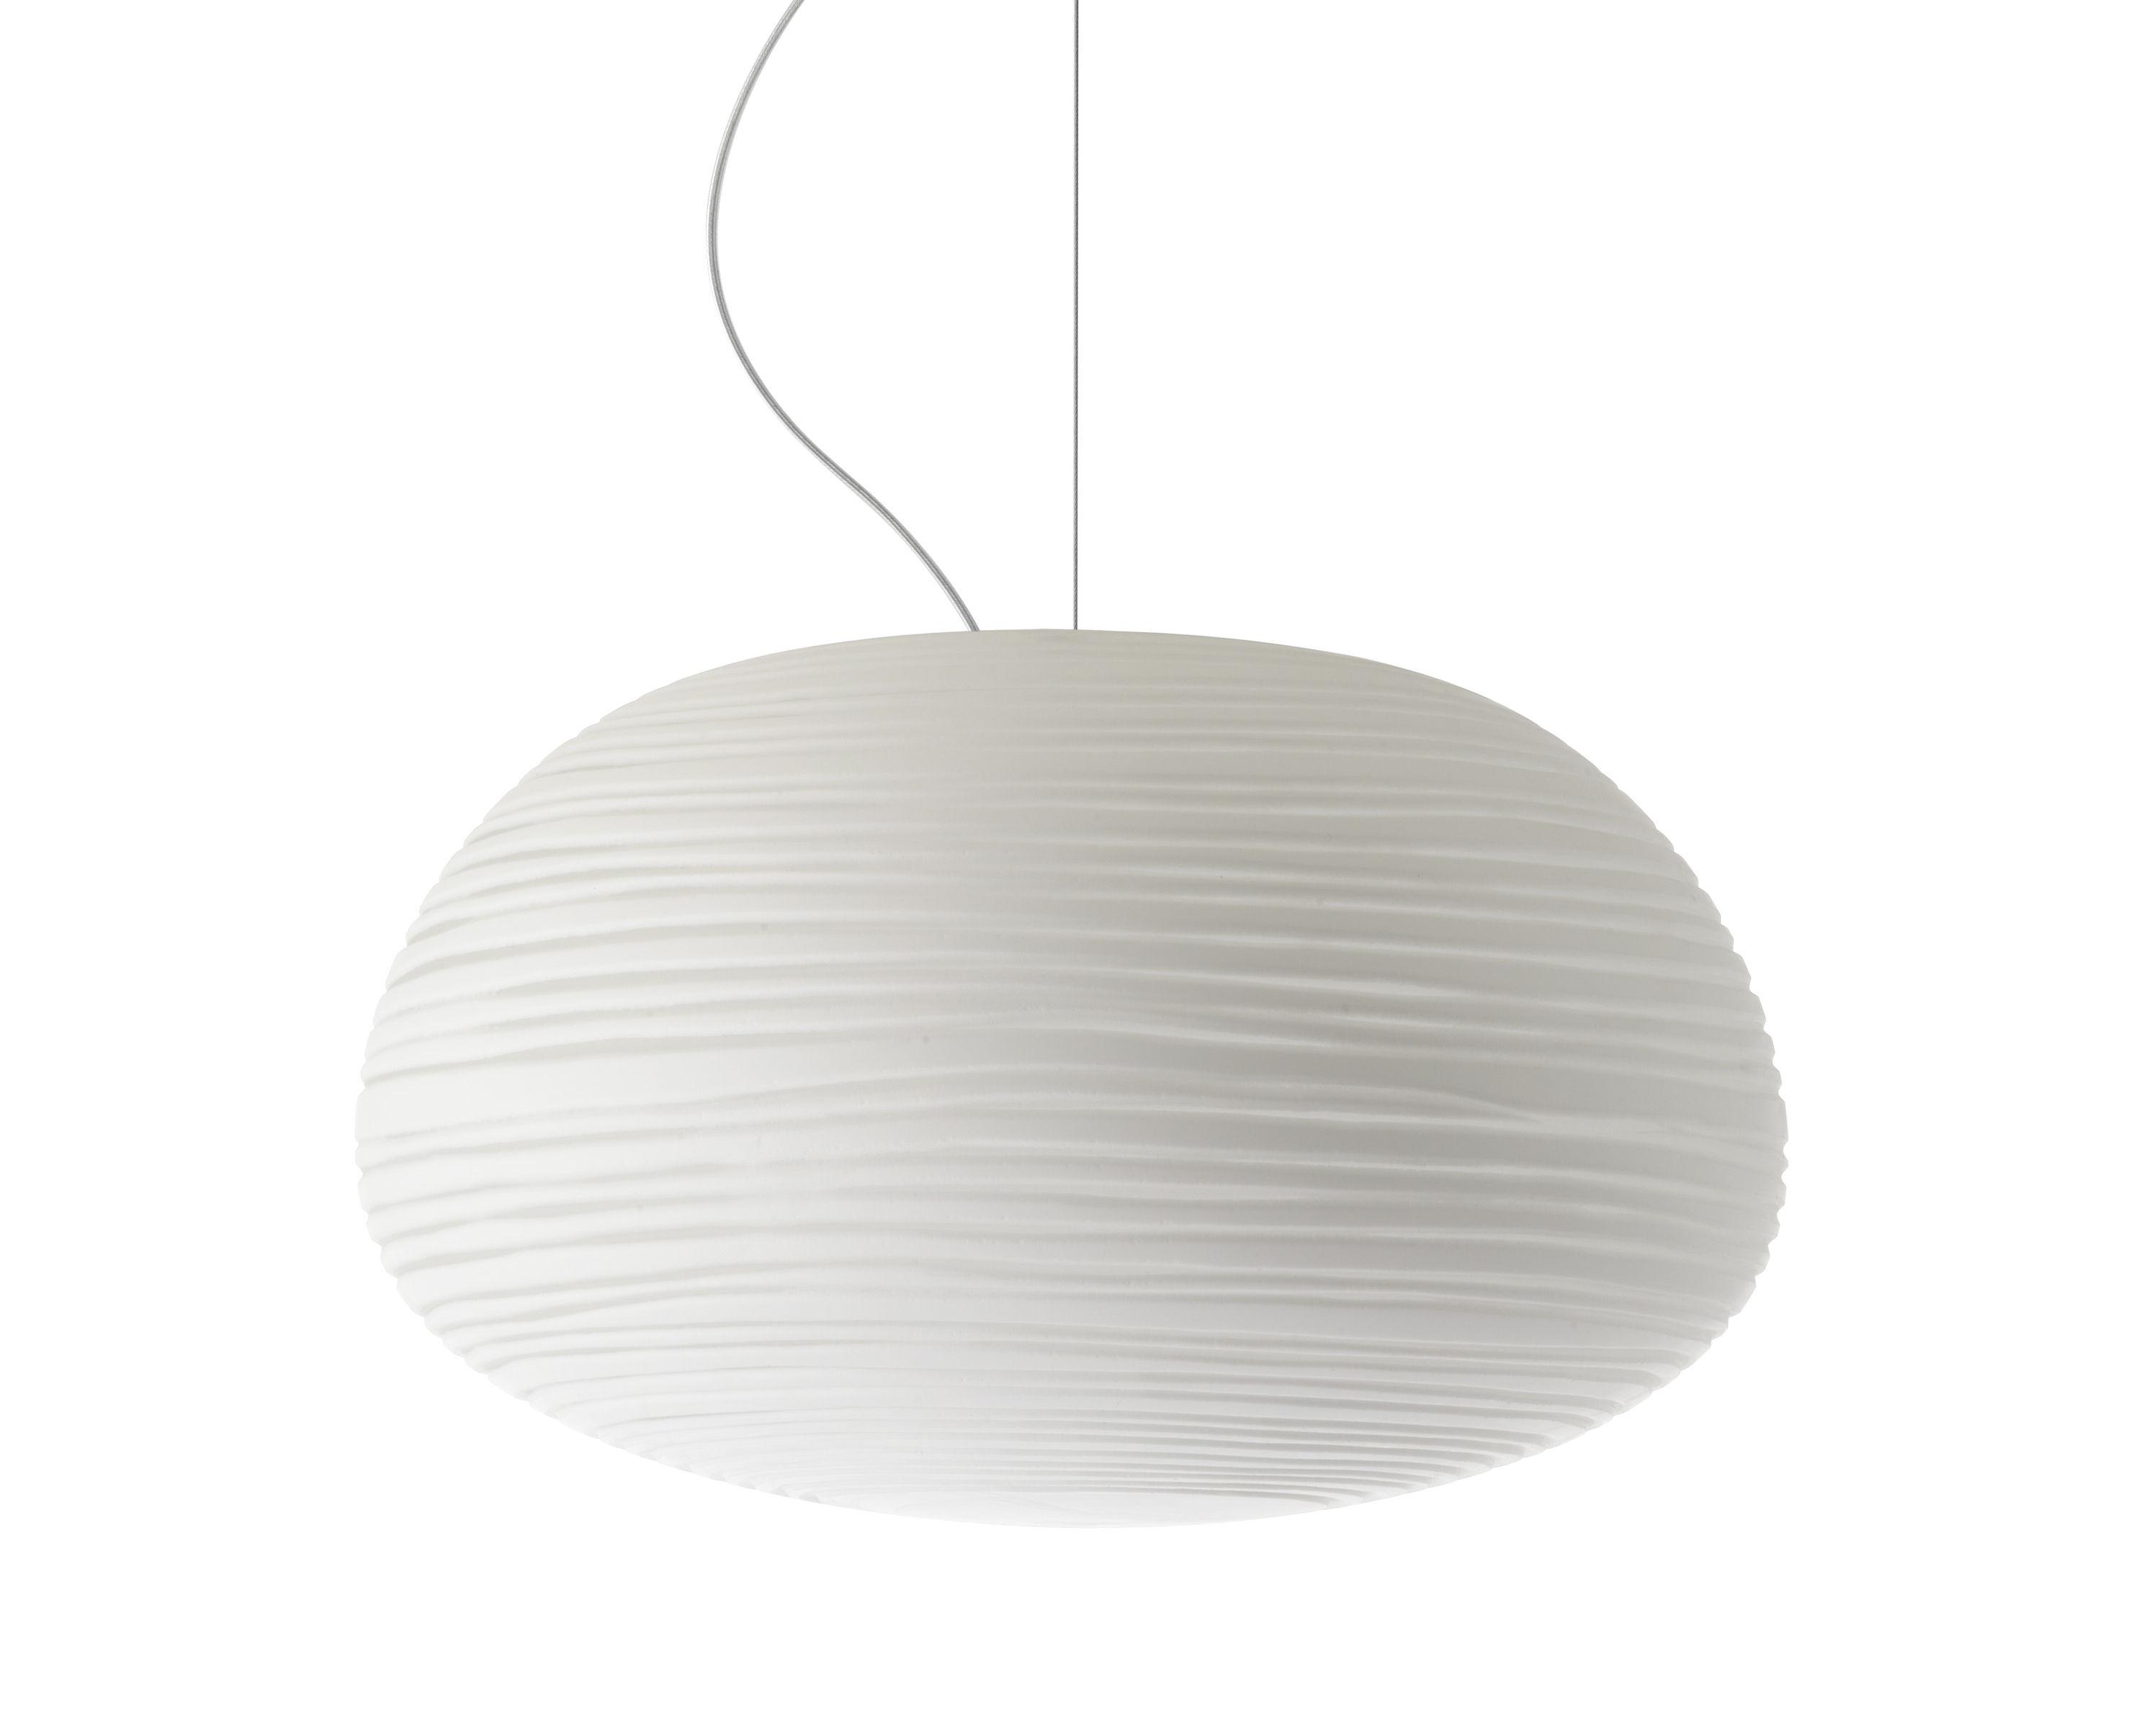 Luminaire - Suspensions - Suspension Rituals 2 / Ø 34 x H 19 cm - Foscarini - Blanc / Ø 34 x H 19 cm - Verre soufflé bouche